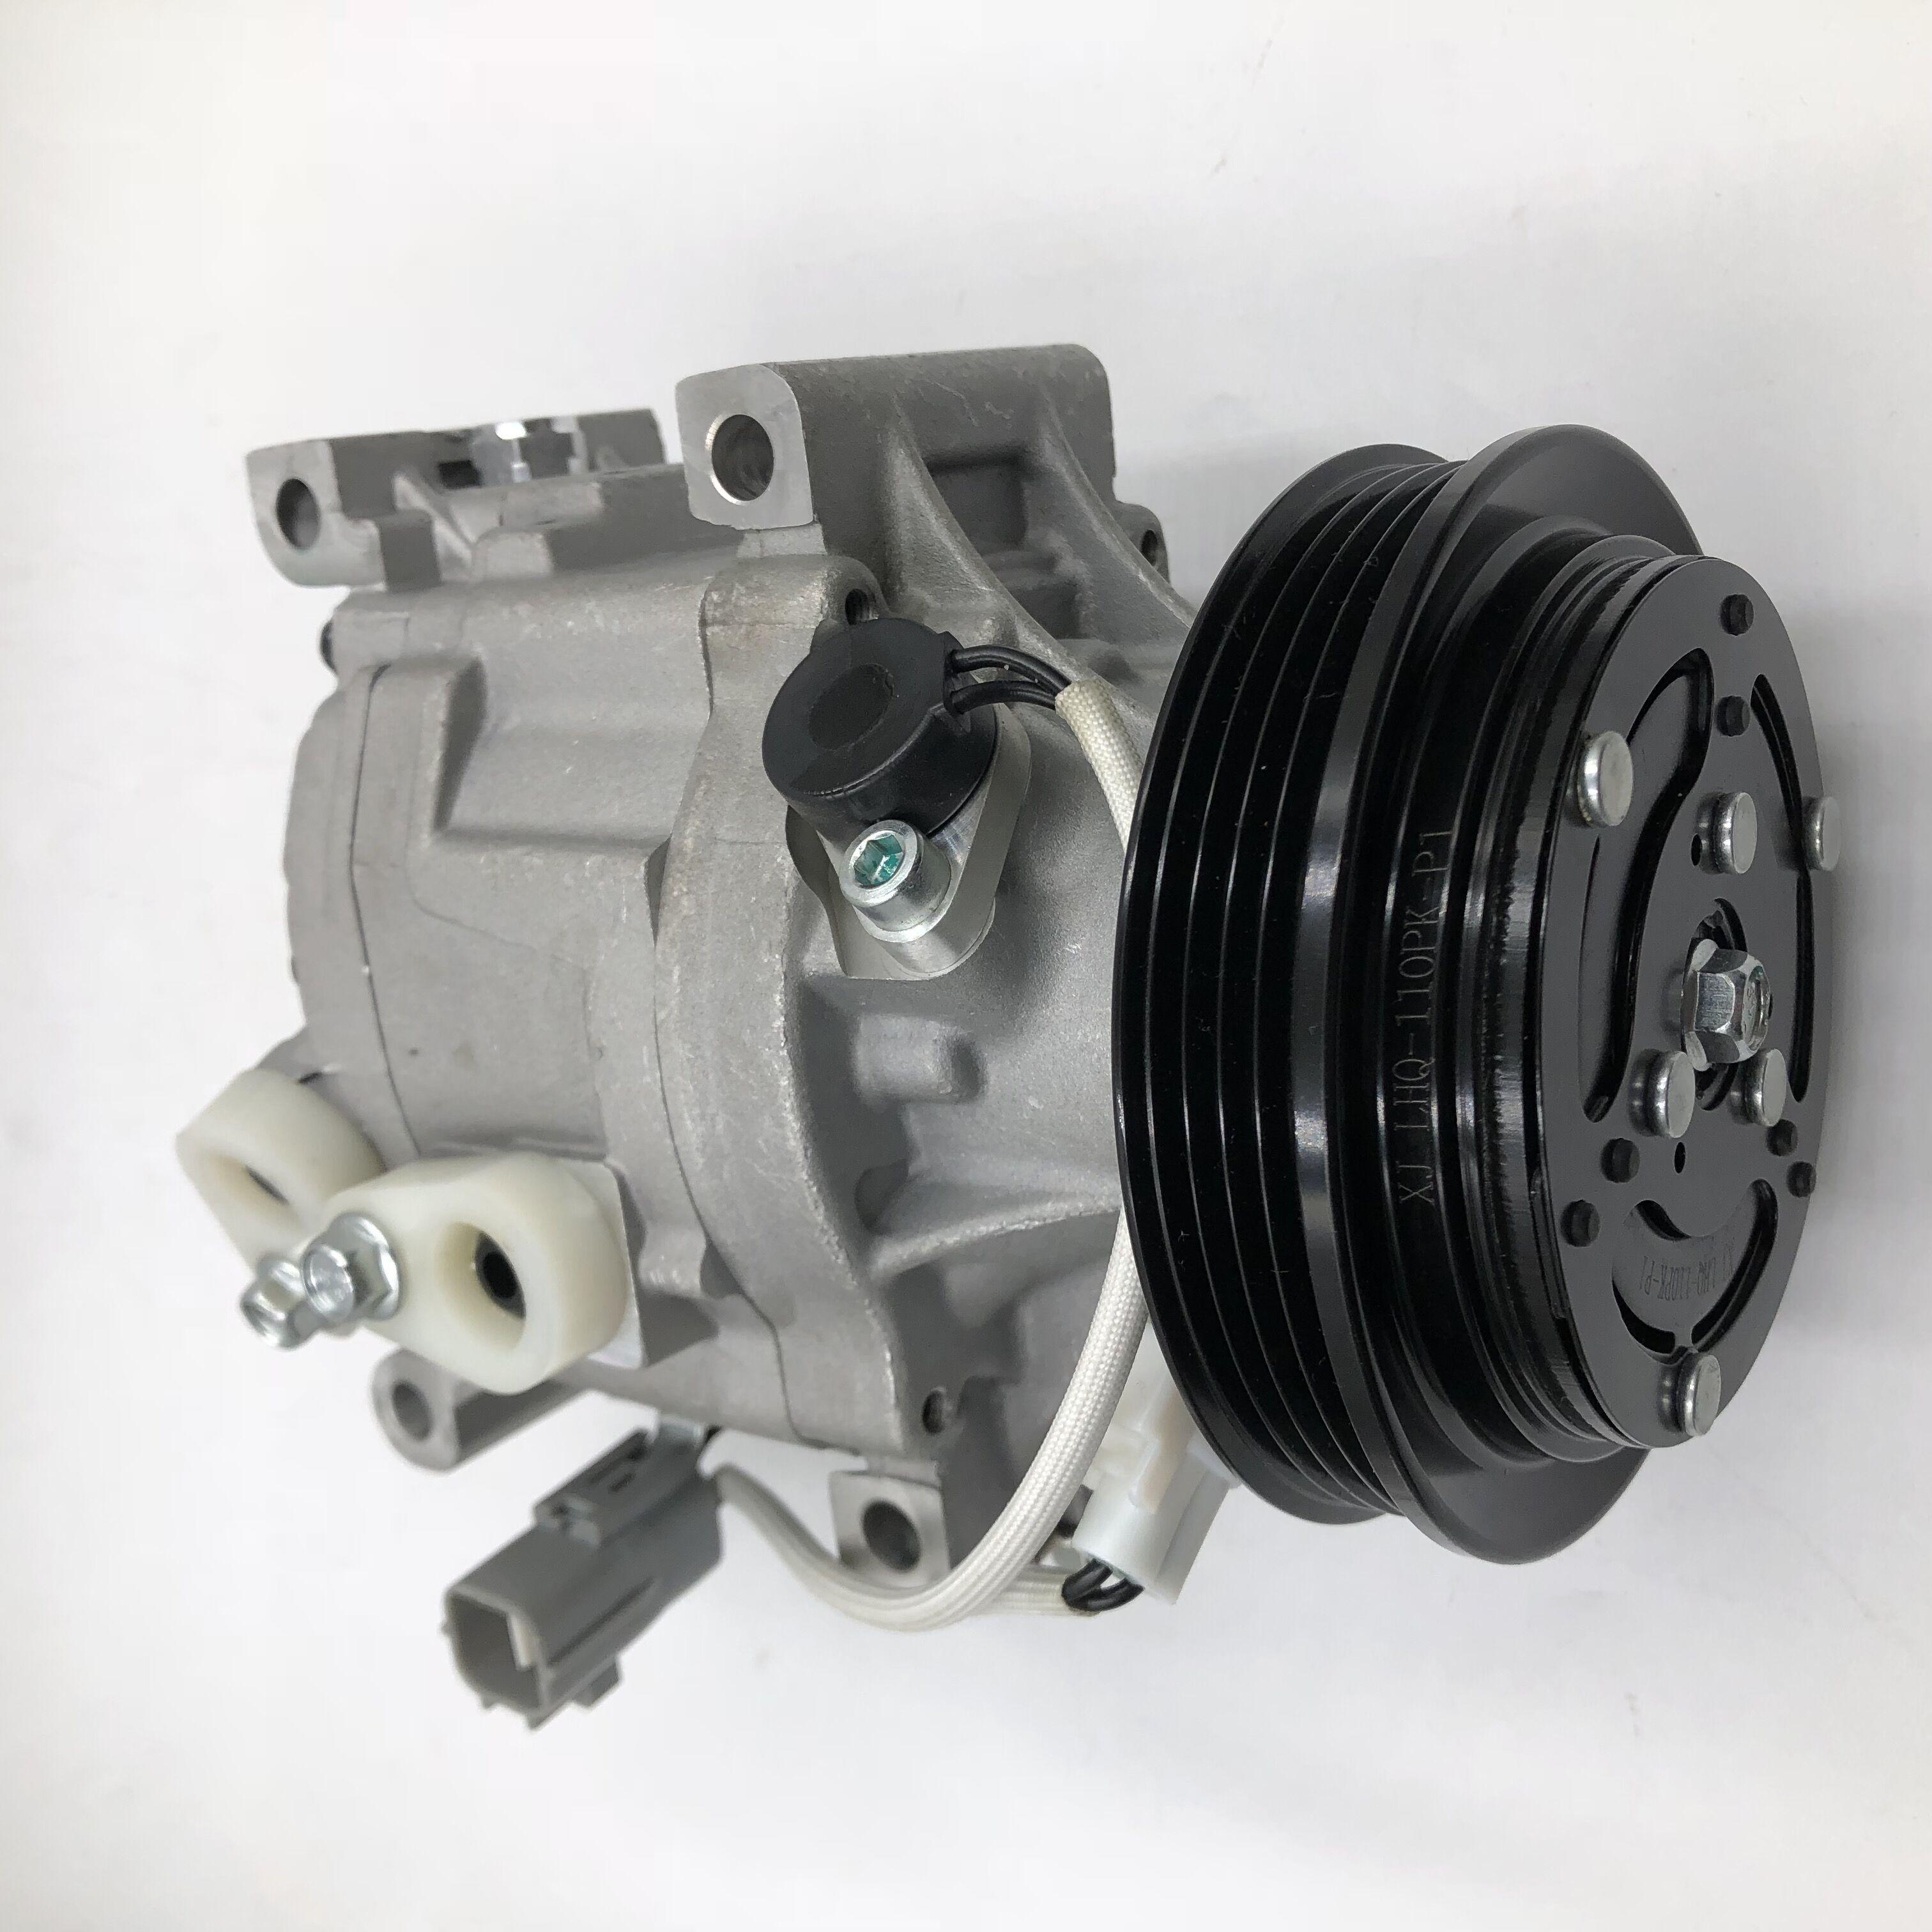 Car AC compressor for Toyota corolla 06c 4PK 12V W/Sensor WXH-066-X2